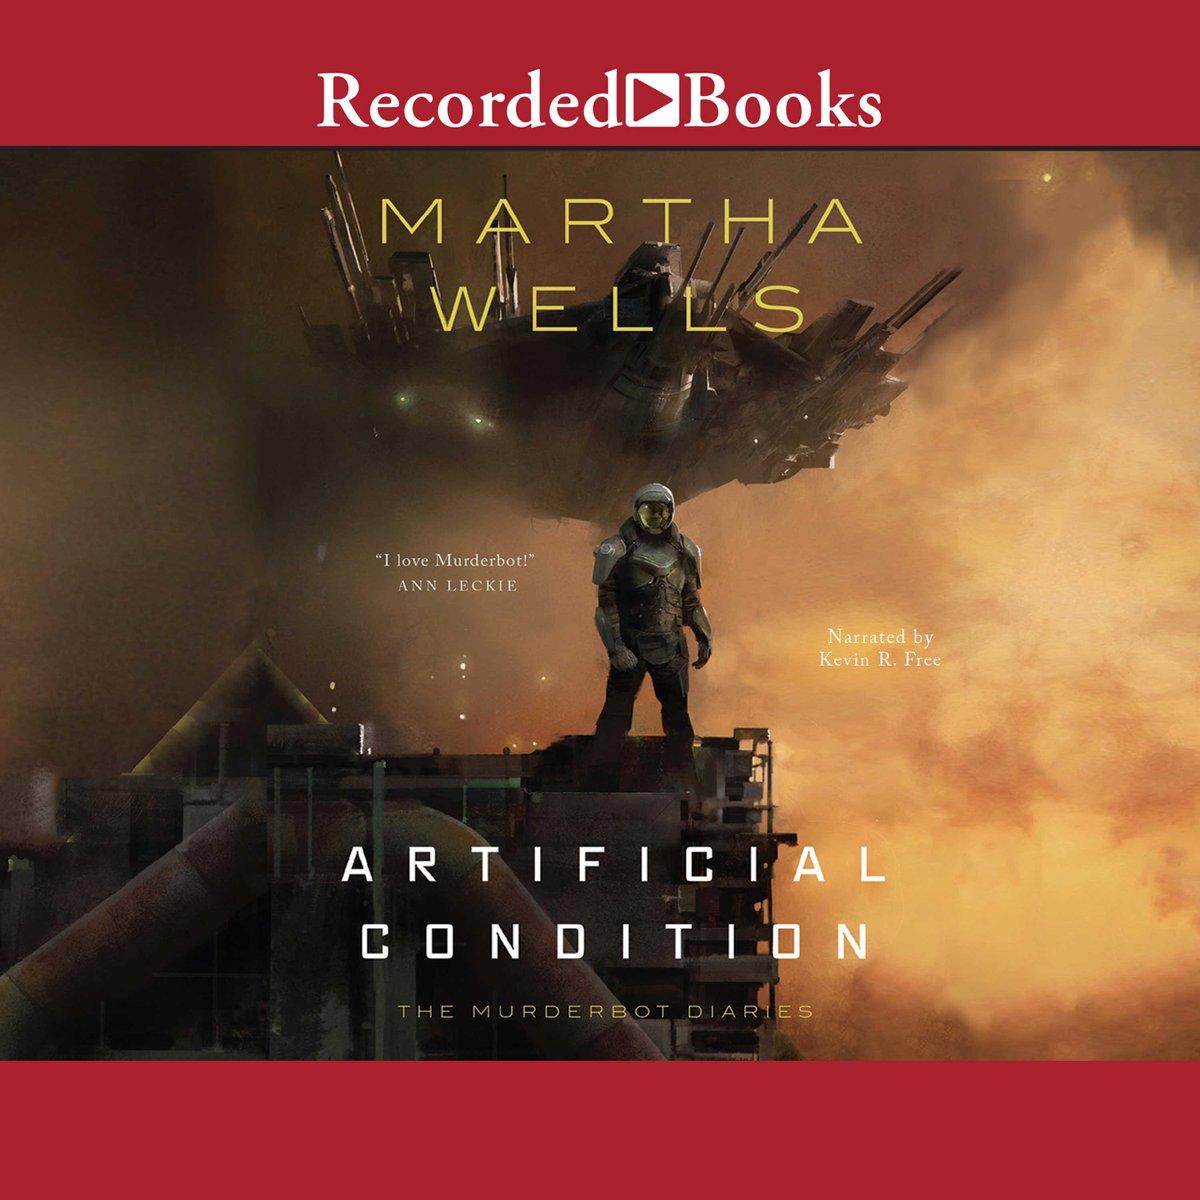 Audiobooks com on Twitter: